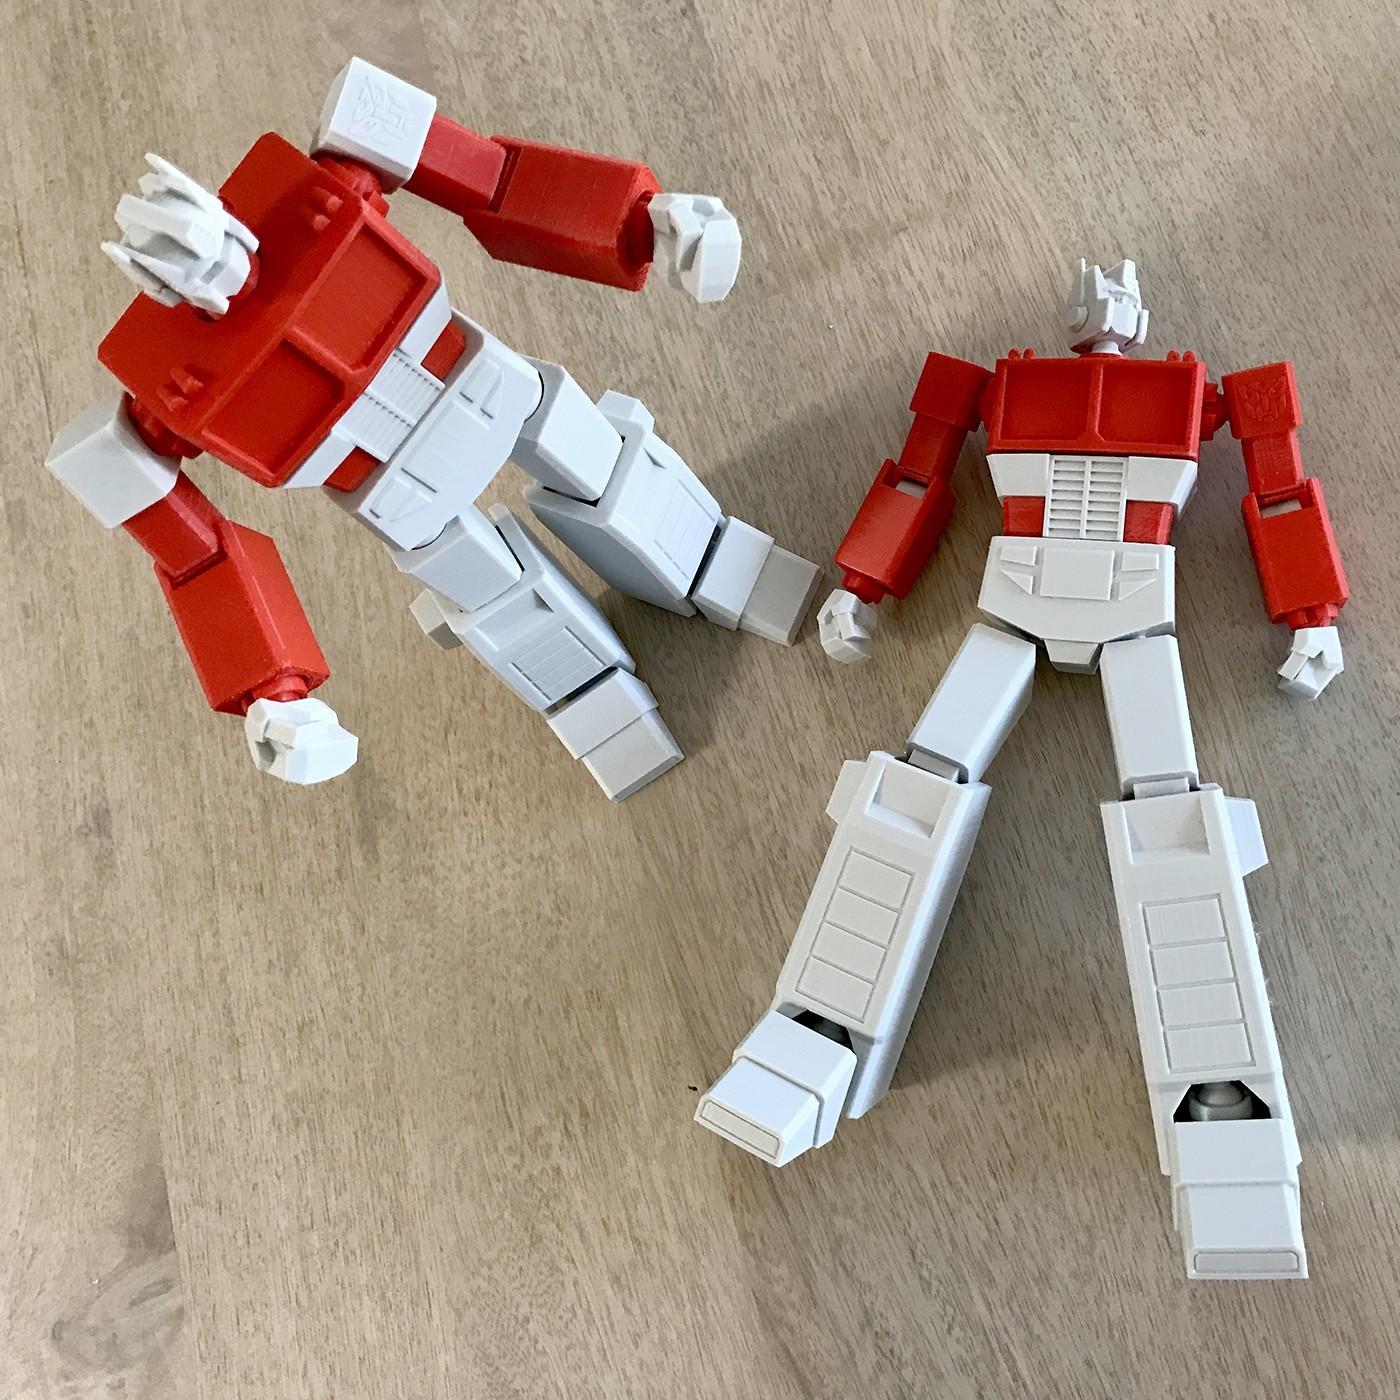 03.jpg Download STL file Low Poly Optimus Prime • Model to 3D print, biglildesign